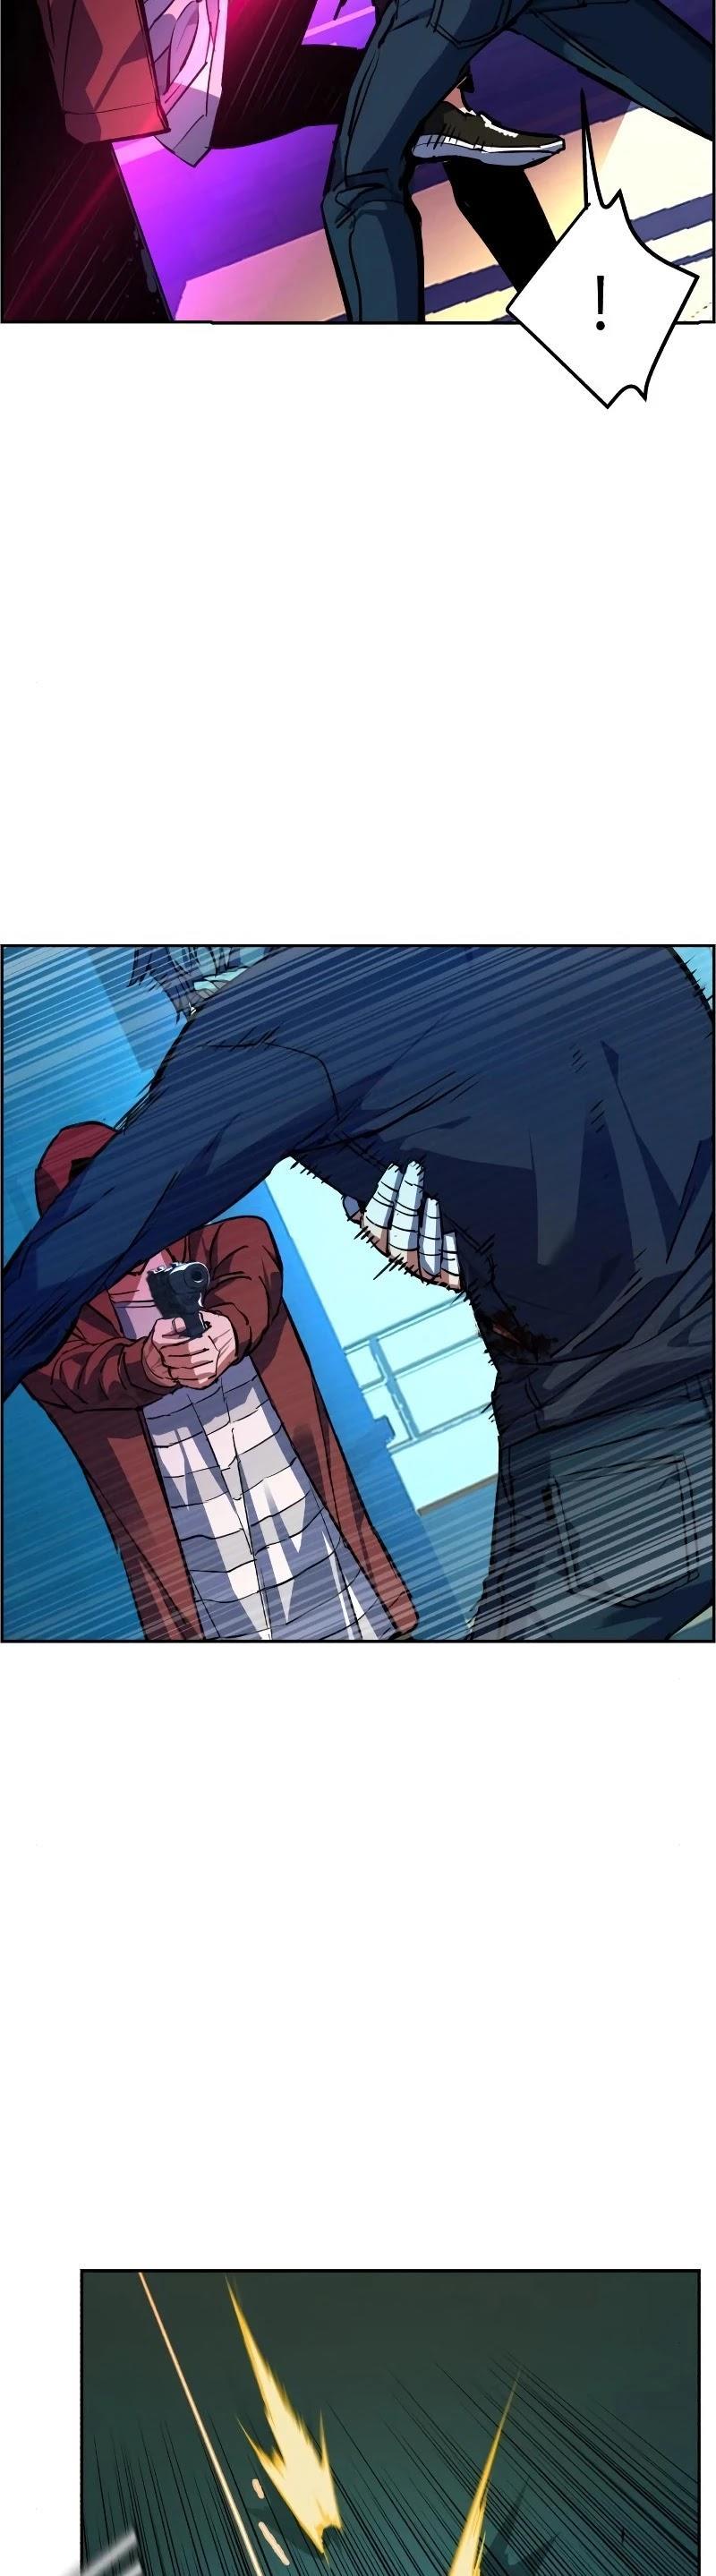 Mercenary Enrollment Chapter 53 page 24 - Mangakakalot